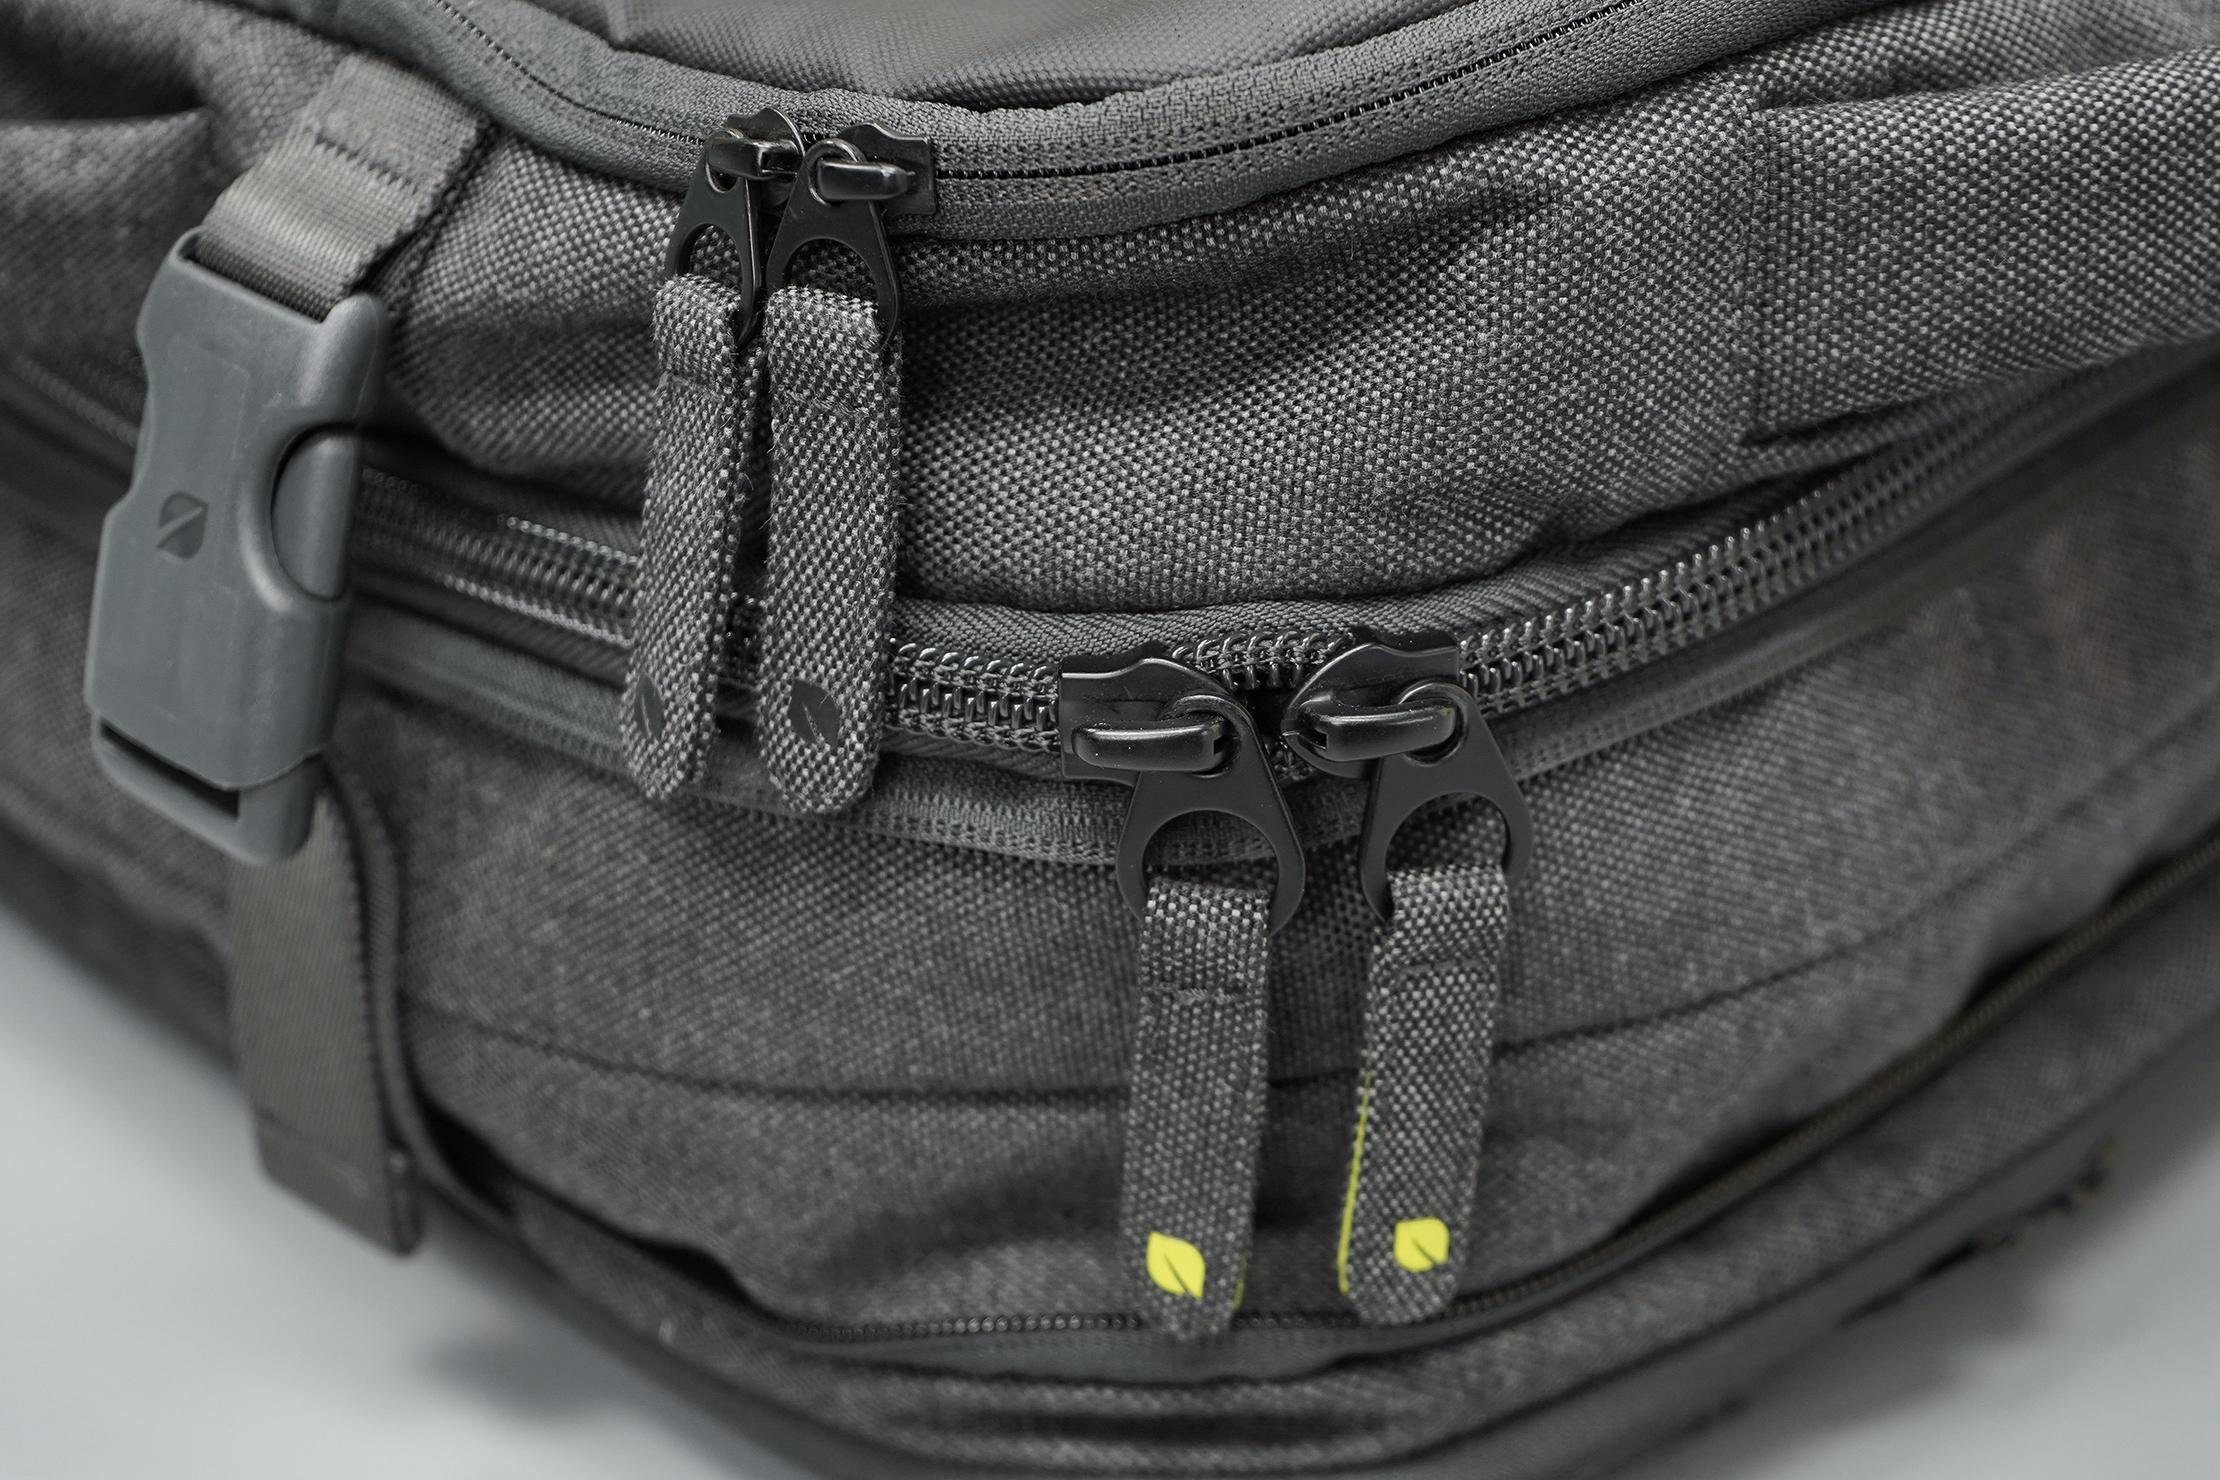 Incase EO Travel Backpack Zippers & Buckles